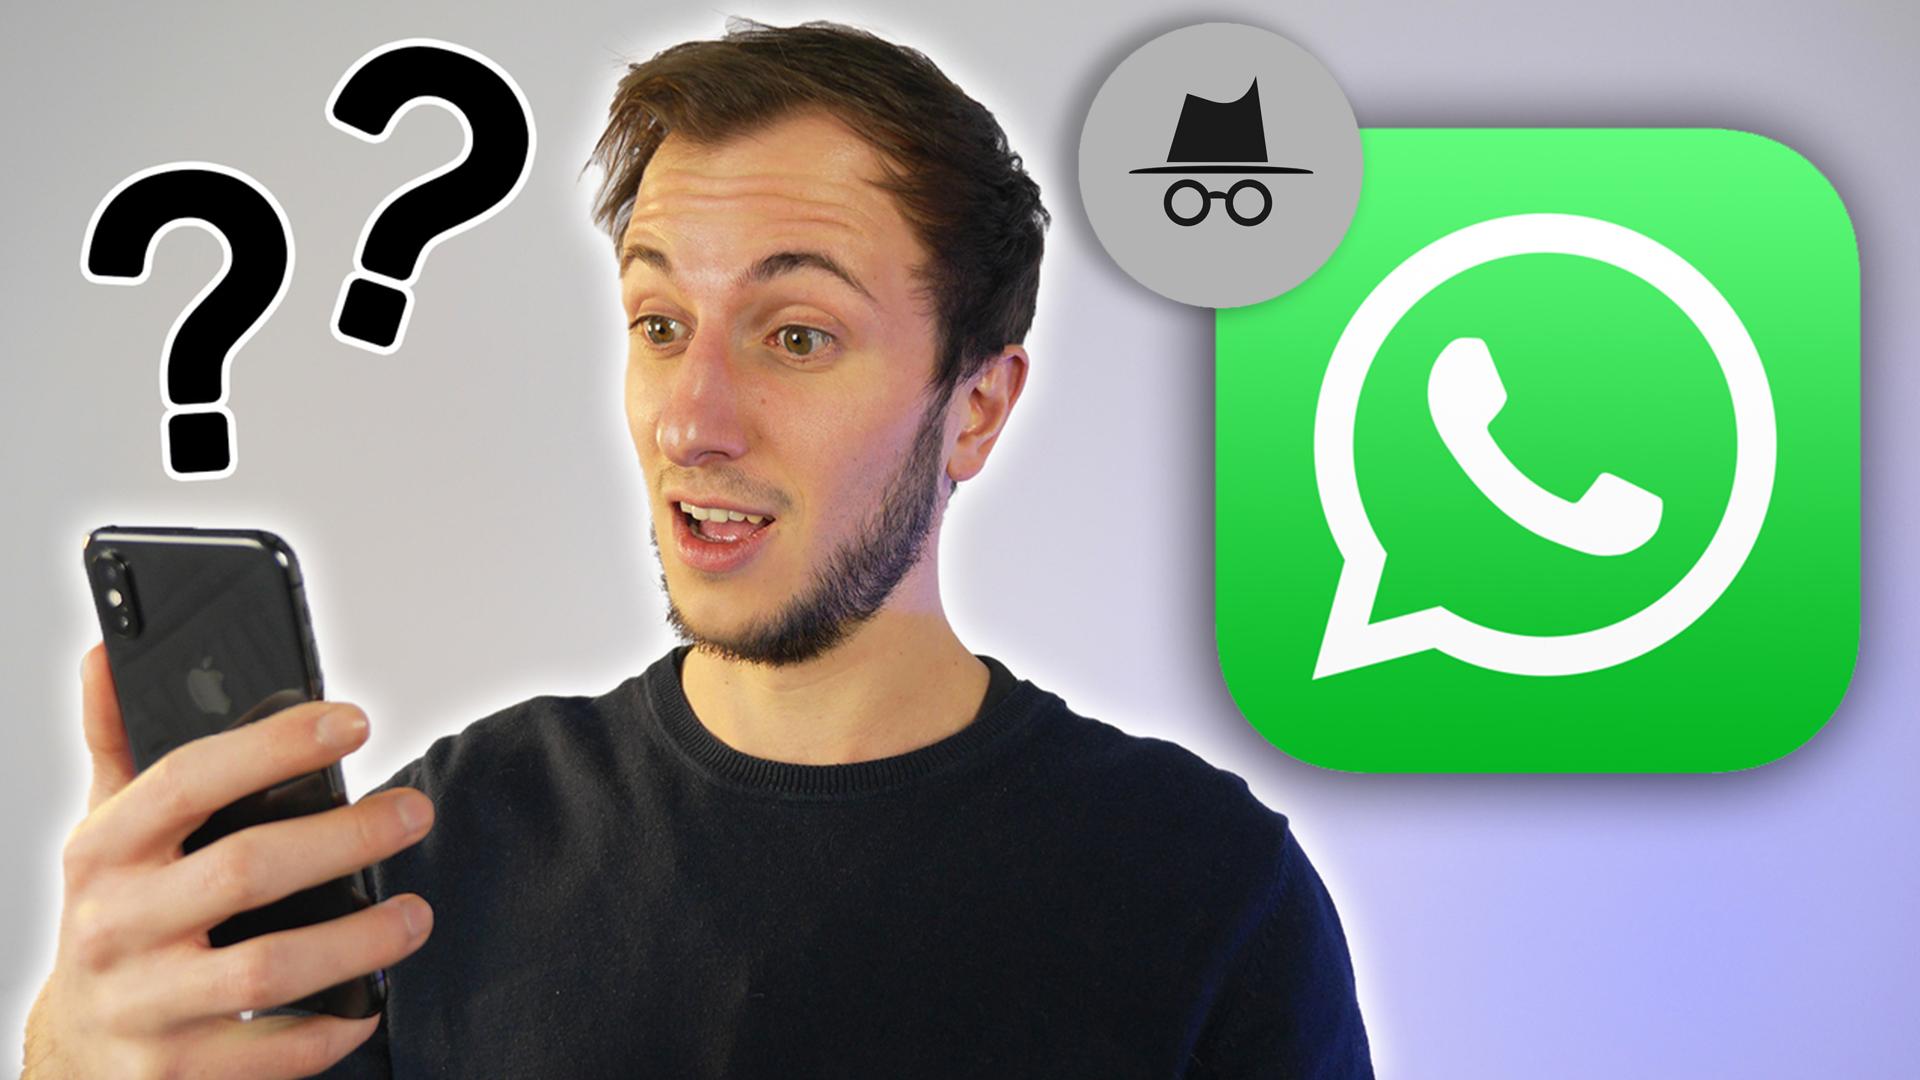 WhatsApp-Status anonym ansehen: So geht's